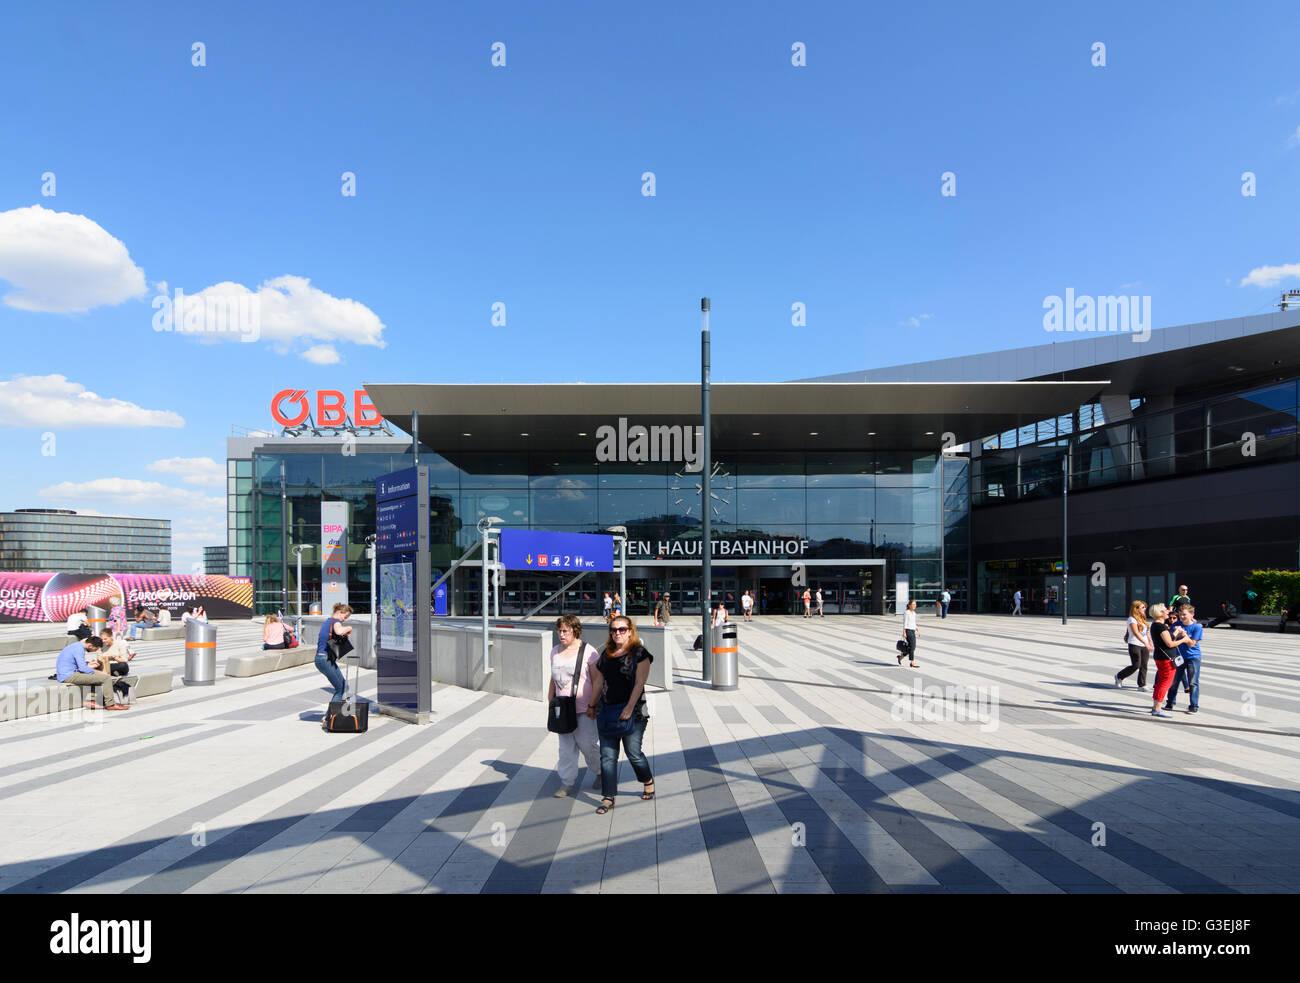 railway station Wien Hauptbahnhof of Austrian Railways ÖBB, Austria, Wien, 10., Wien, Vienna - Stock Image